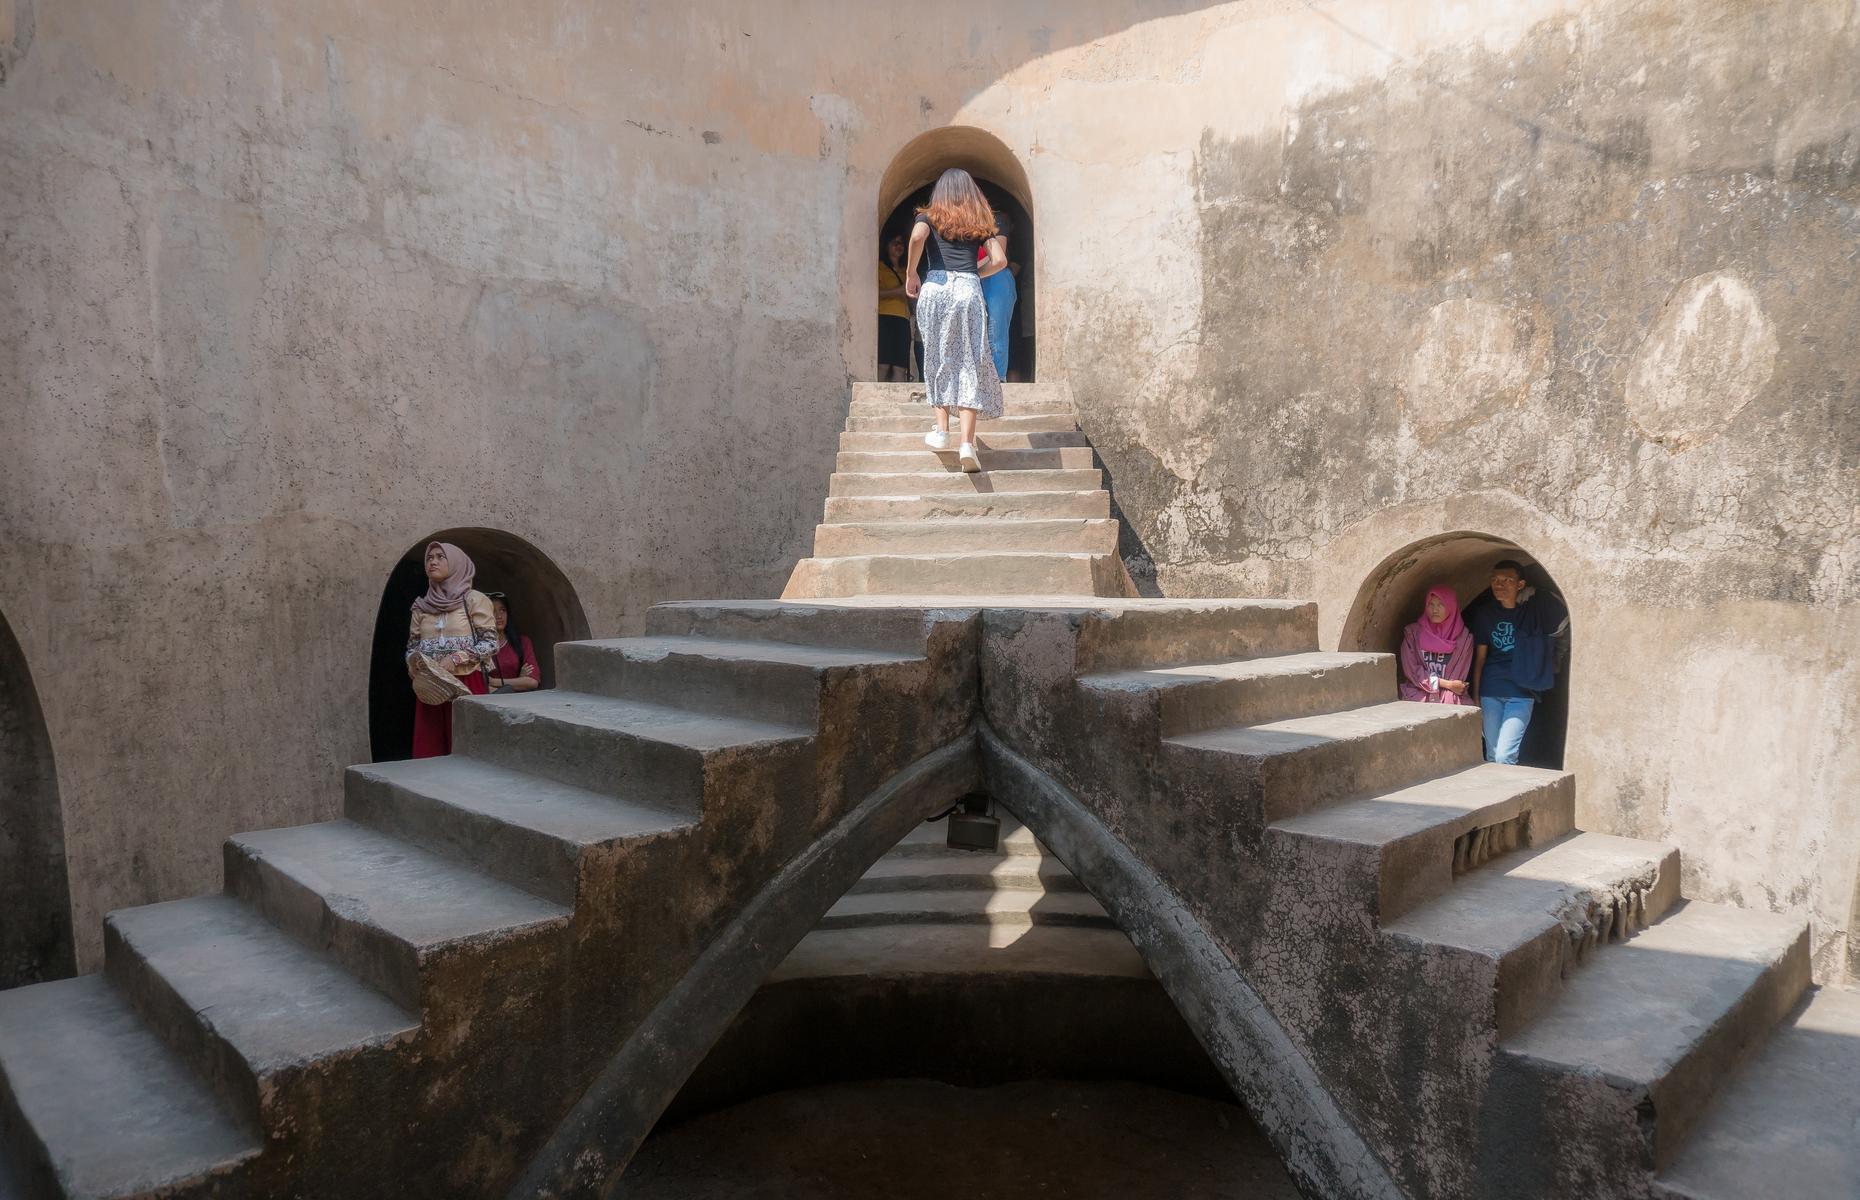 Tamin Sari castle (Image: Anom Harya/Shutterstock)